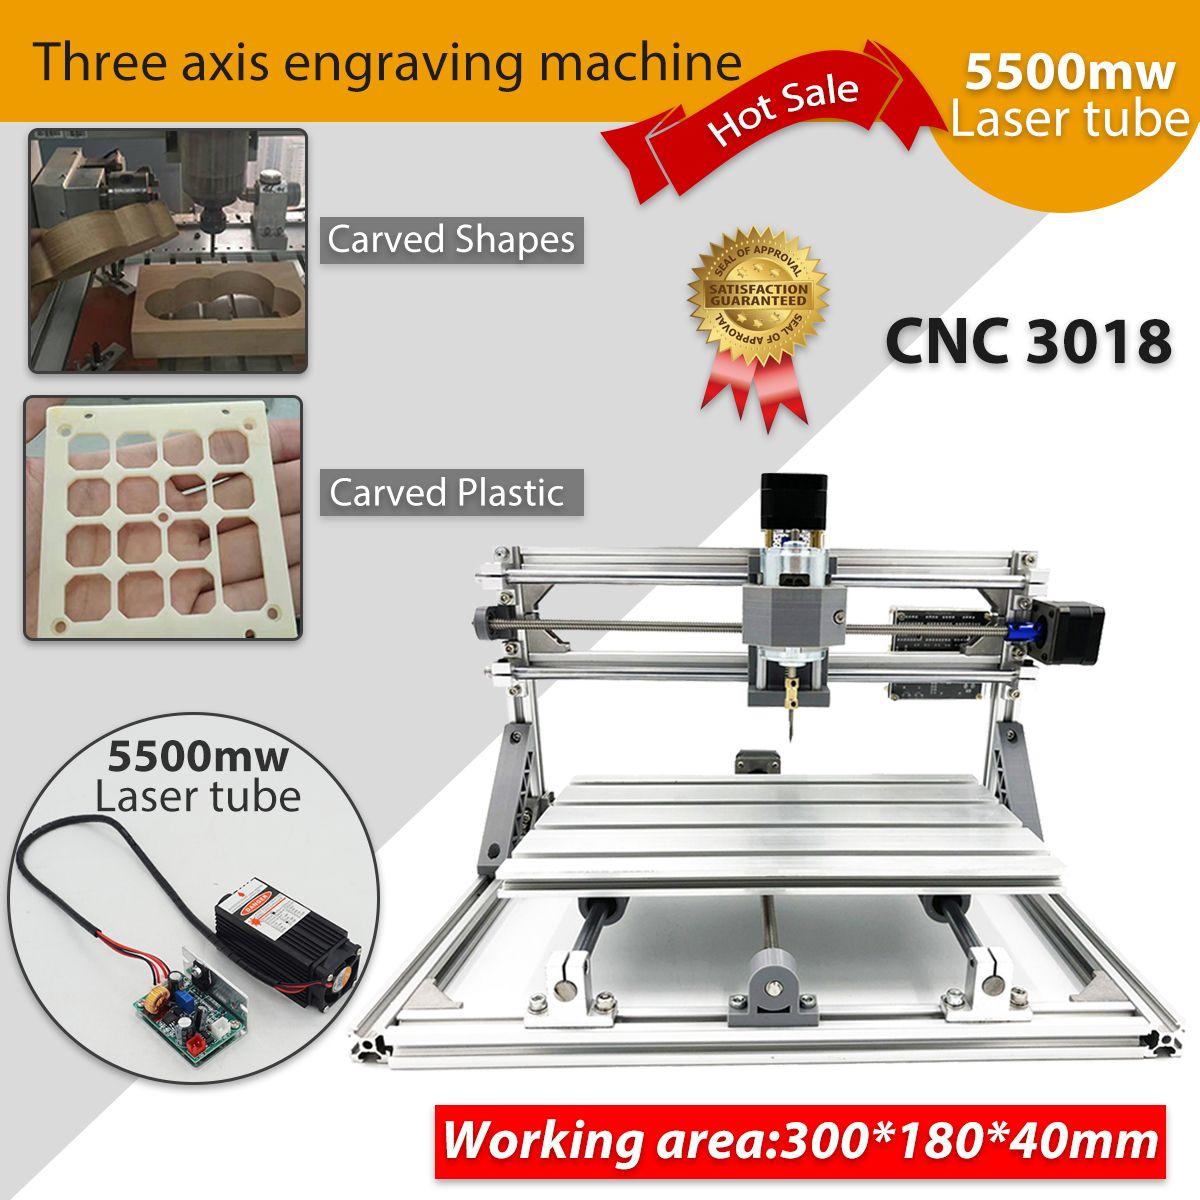 CNC 3018 5500mw/2500mw Laser mini cnc engraving machine cnc milling machine cnc kit Wood Router